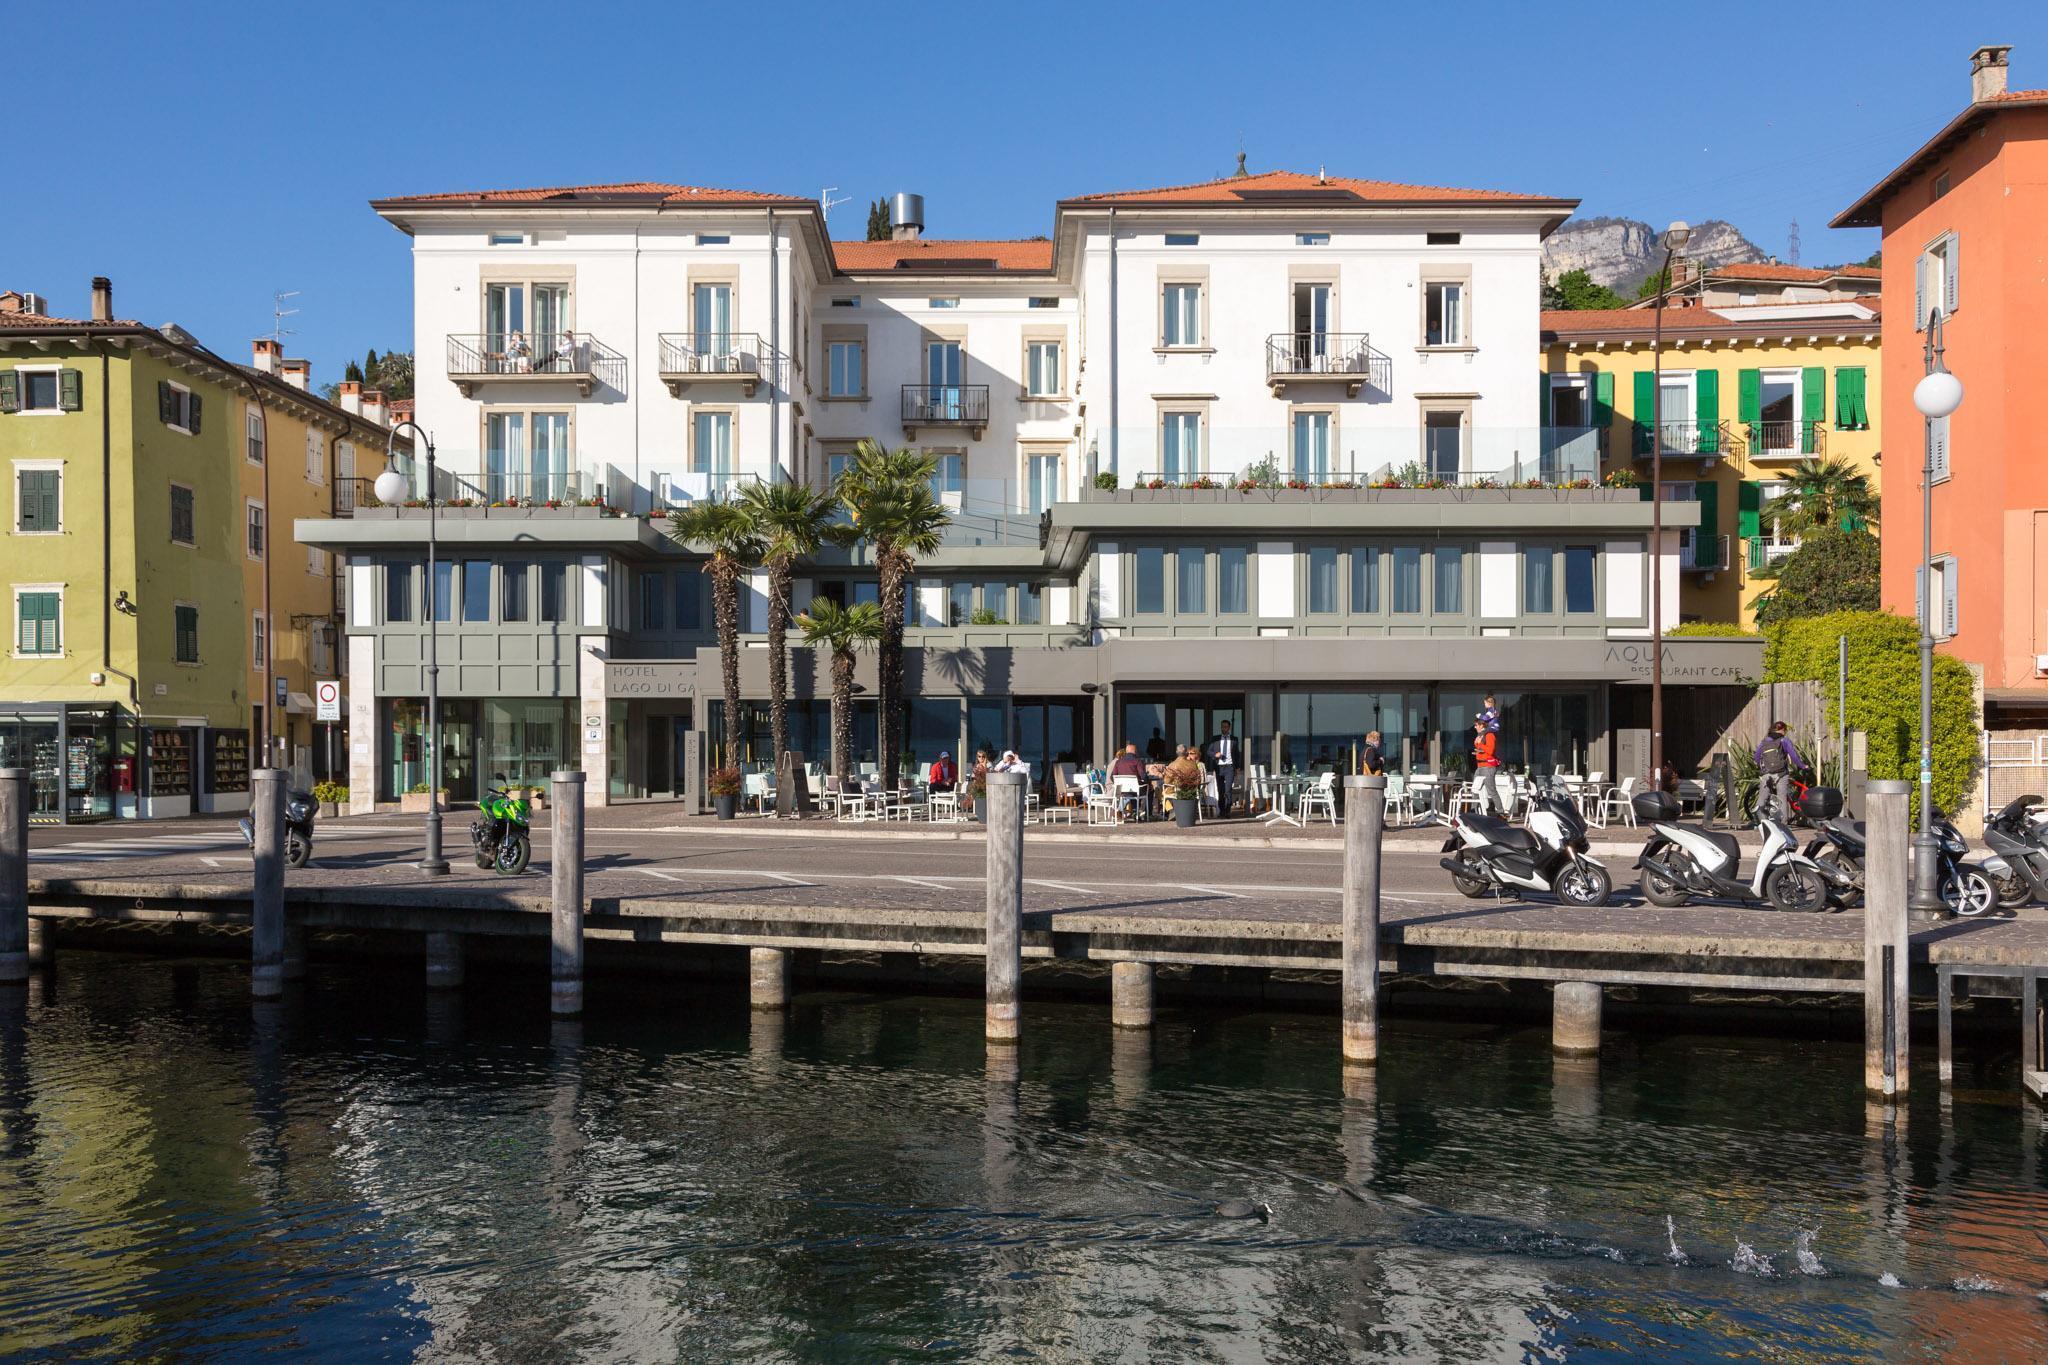 Hotel lago di garda in nago torbole room deals photos reviews - Hotel lago garda piscina coperta ...